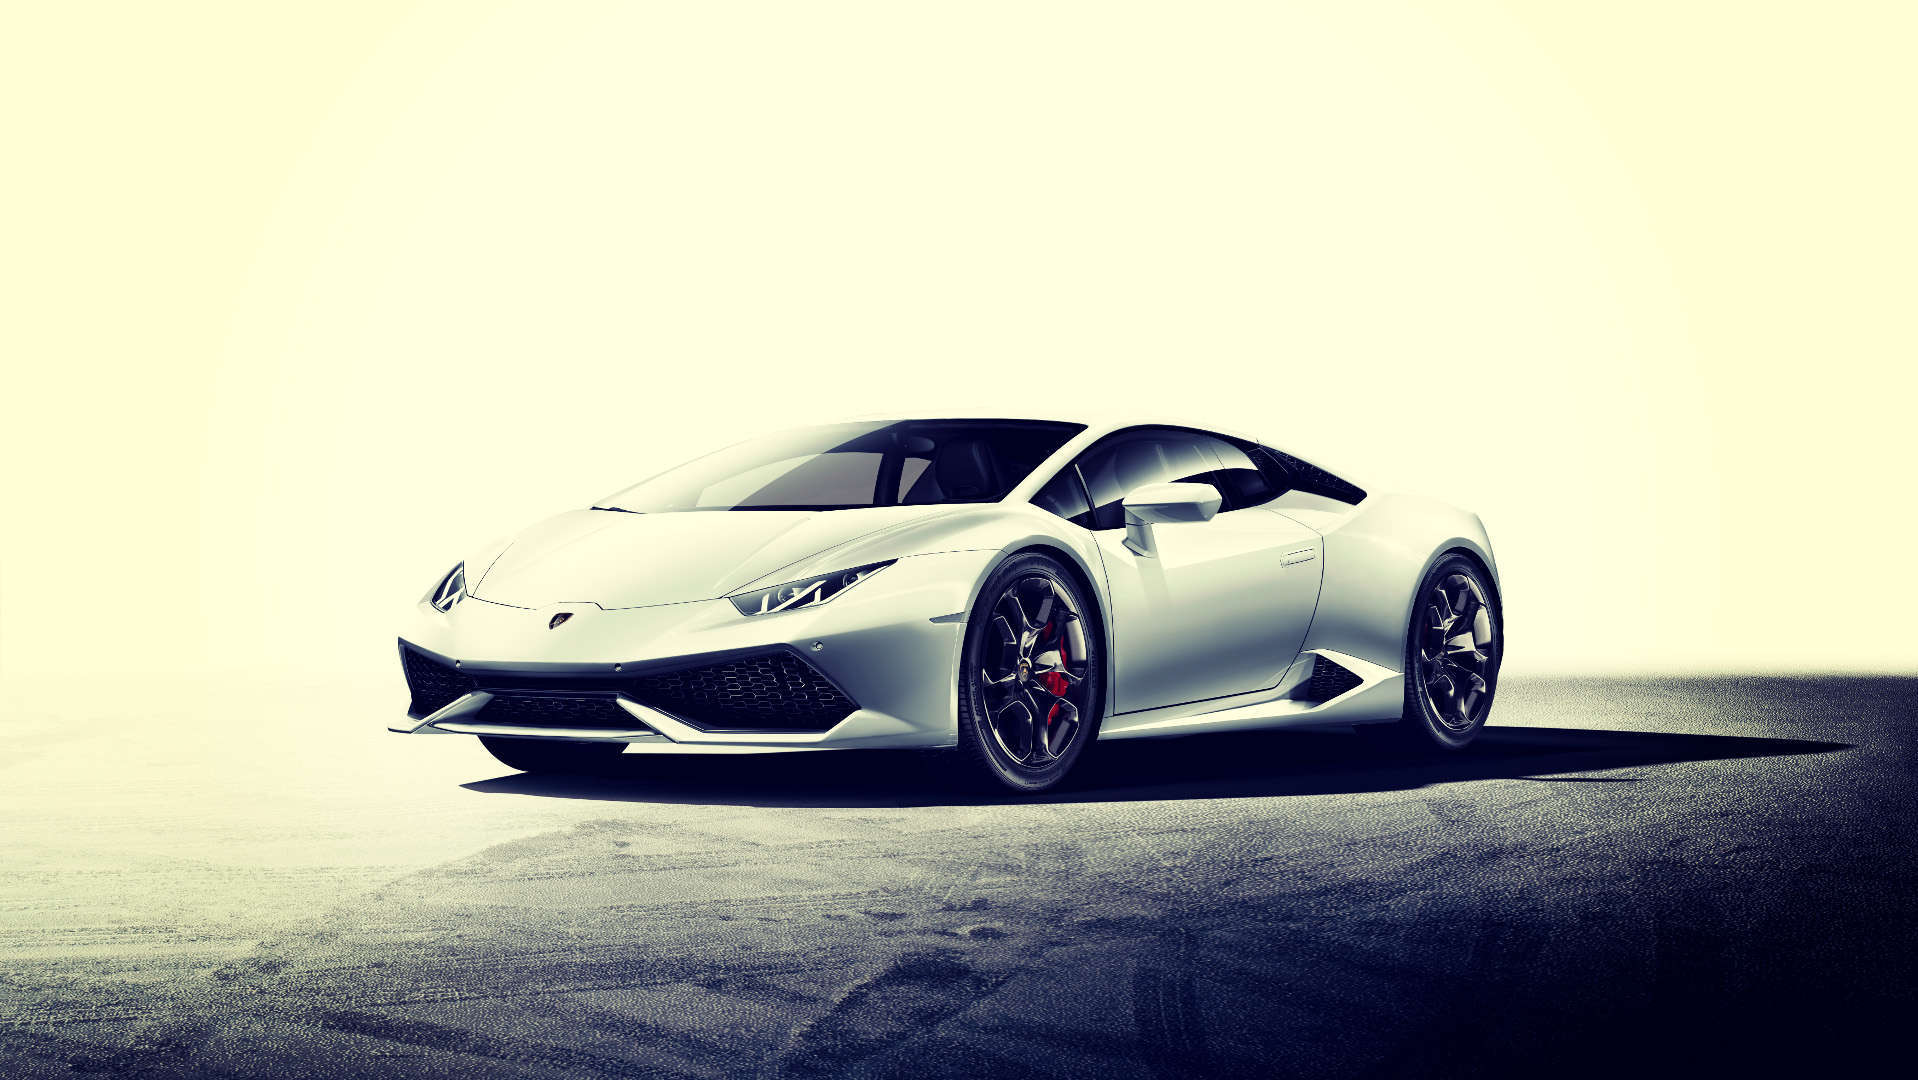 lamborghini huracan white okemobil - Lamborghini Huracan Hd Wallpapers 1080p